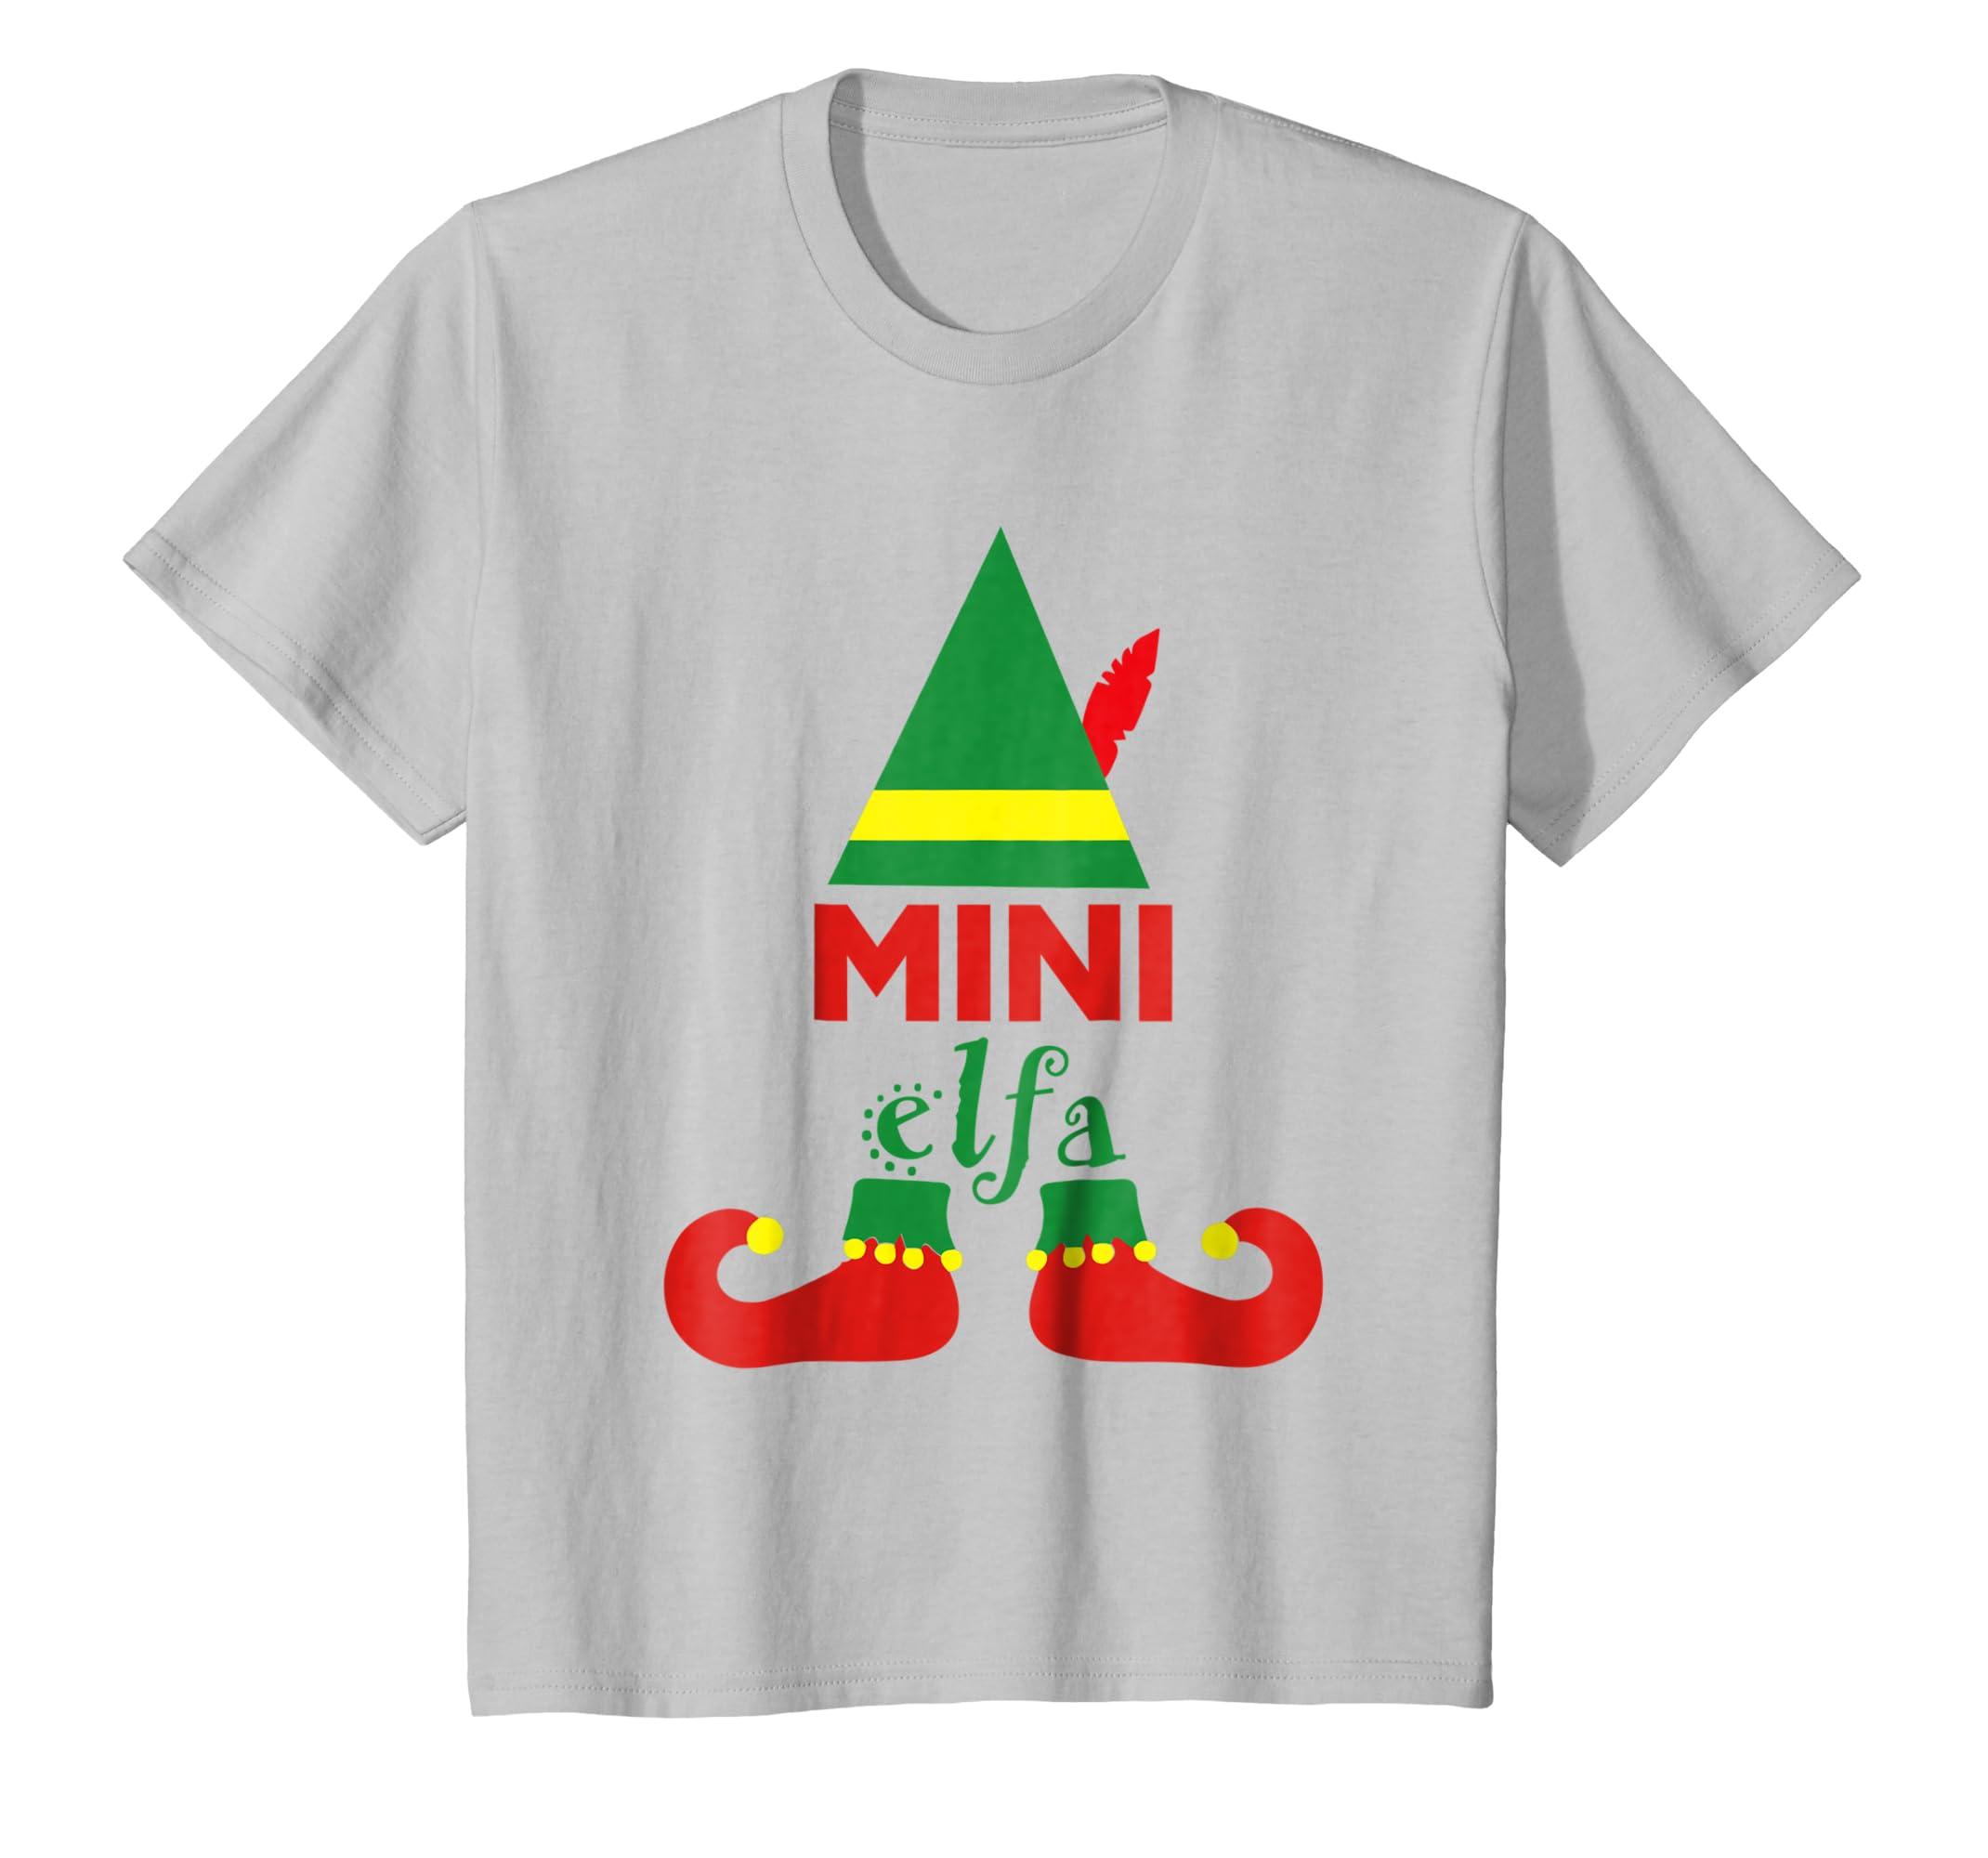 Amazon.com: Pijamas de Navidad para Familia - Camiseta Navidena Hija: Clothing